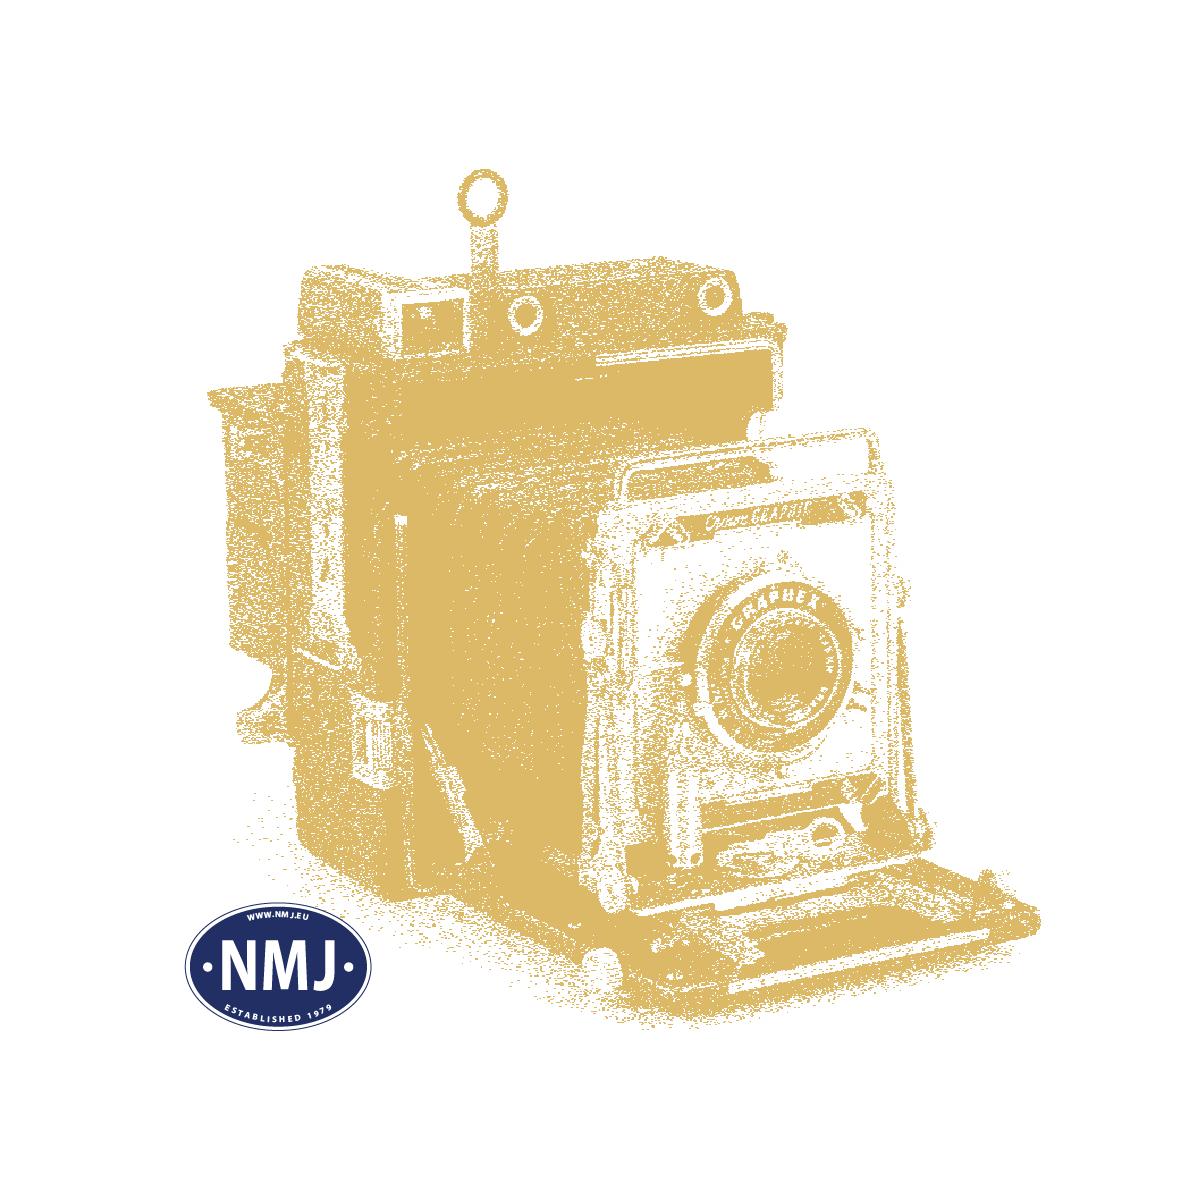 "NMJT110.302 - NMJ Topline NSB FR3-2 21264 ""NSB Meny Café"""